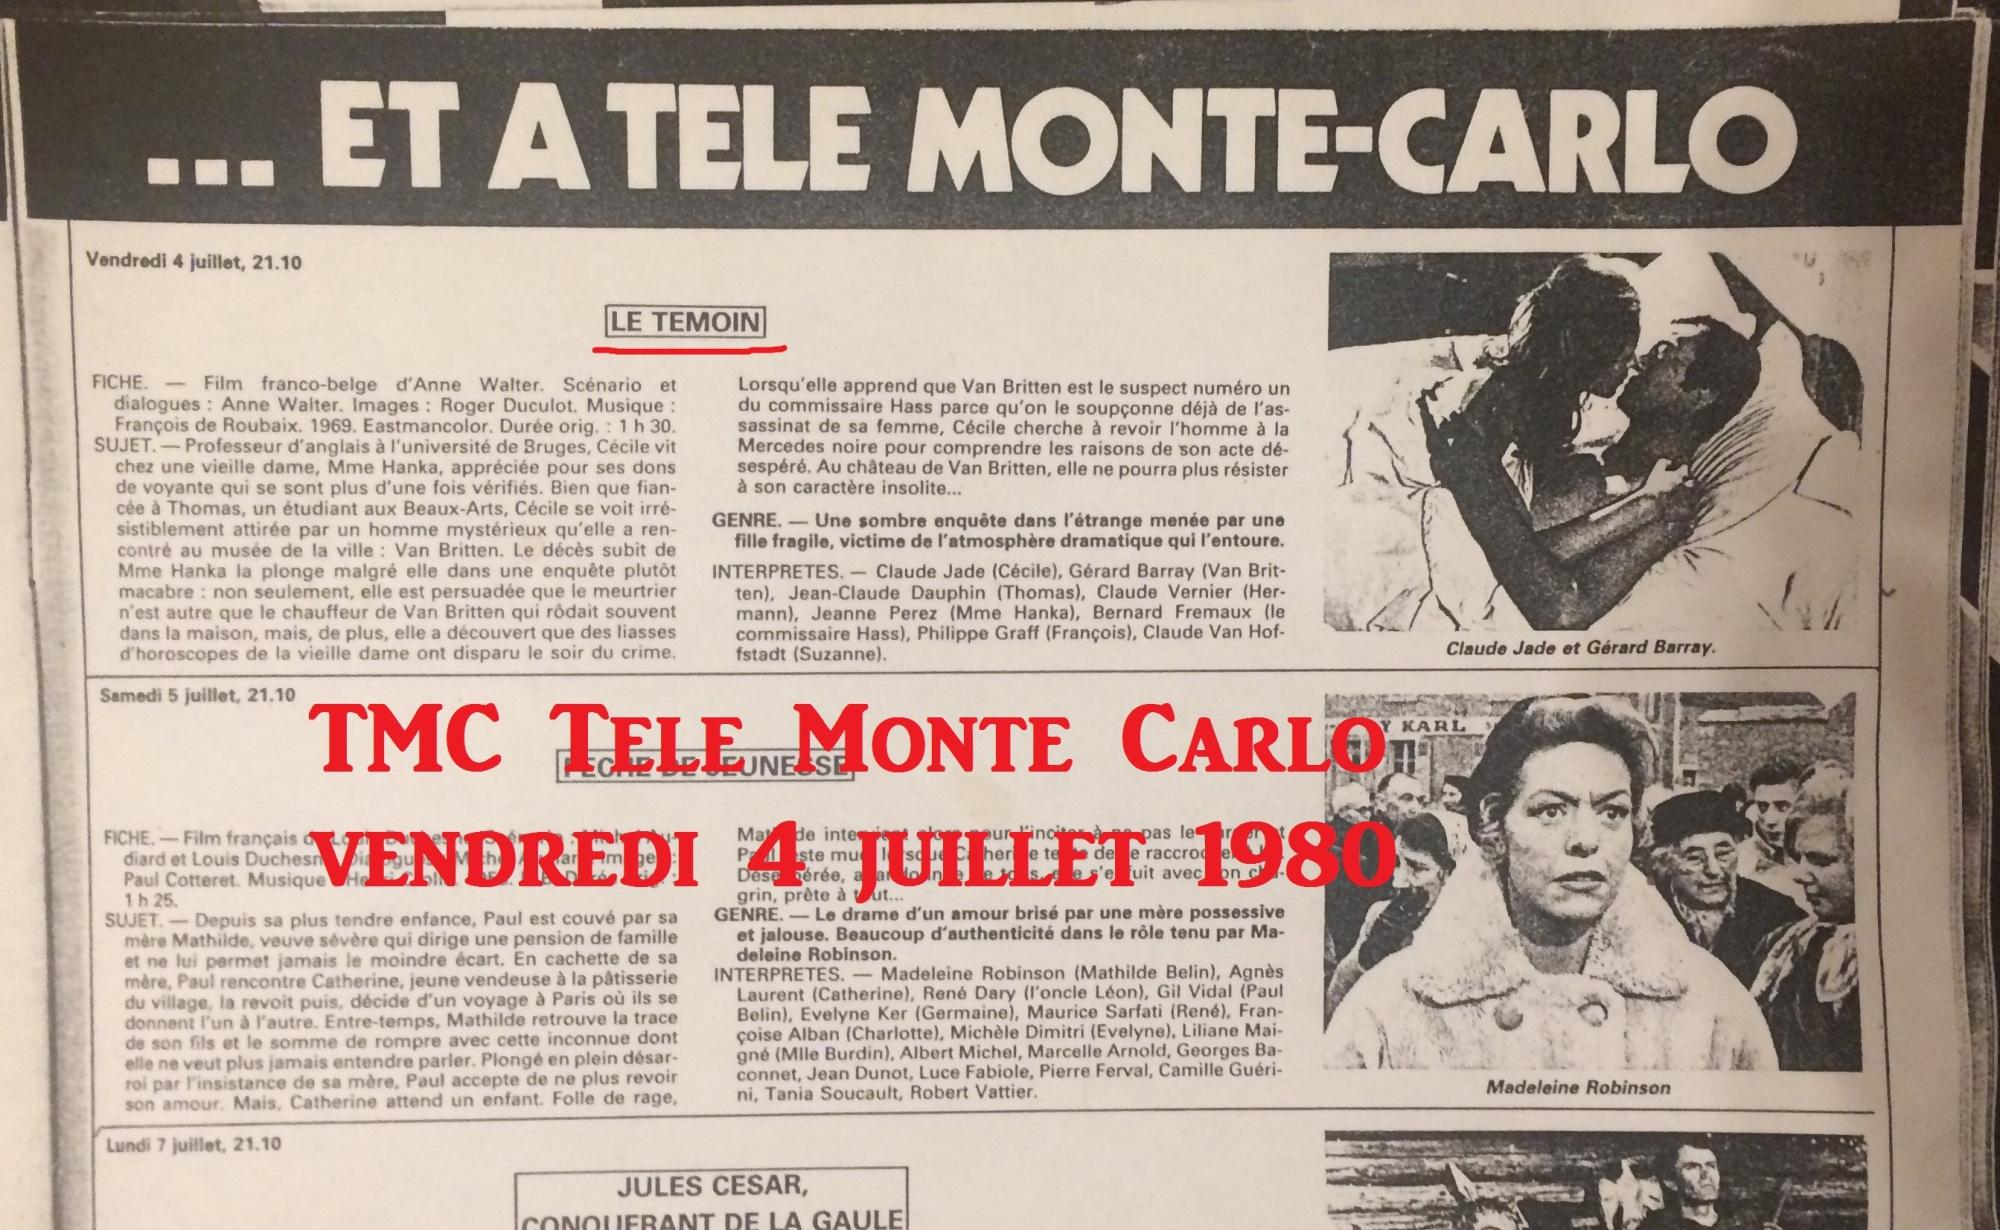 Le temoin Anne Walter Der Zeuge Claude Jade Gerard Barray Tele Monte Carlo 4 juillet 1980